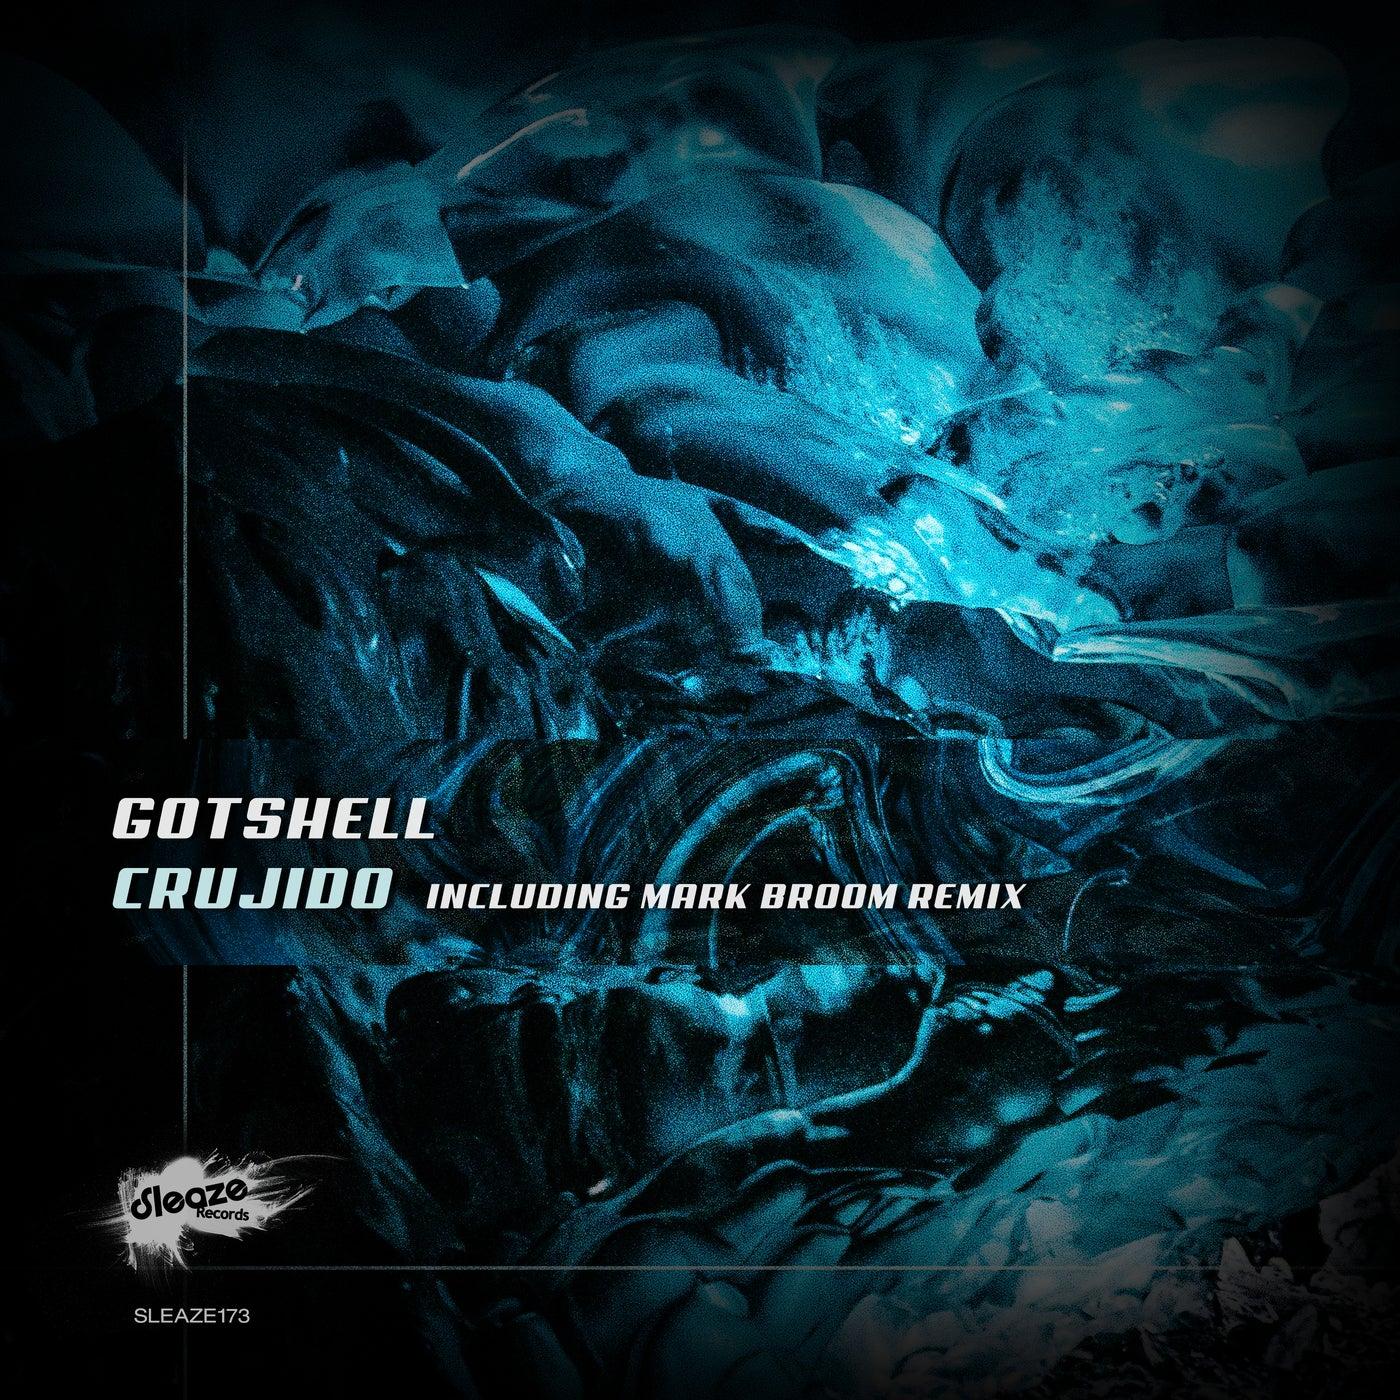 Crujido (Mark Broom Remix)